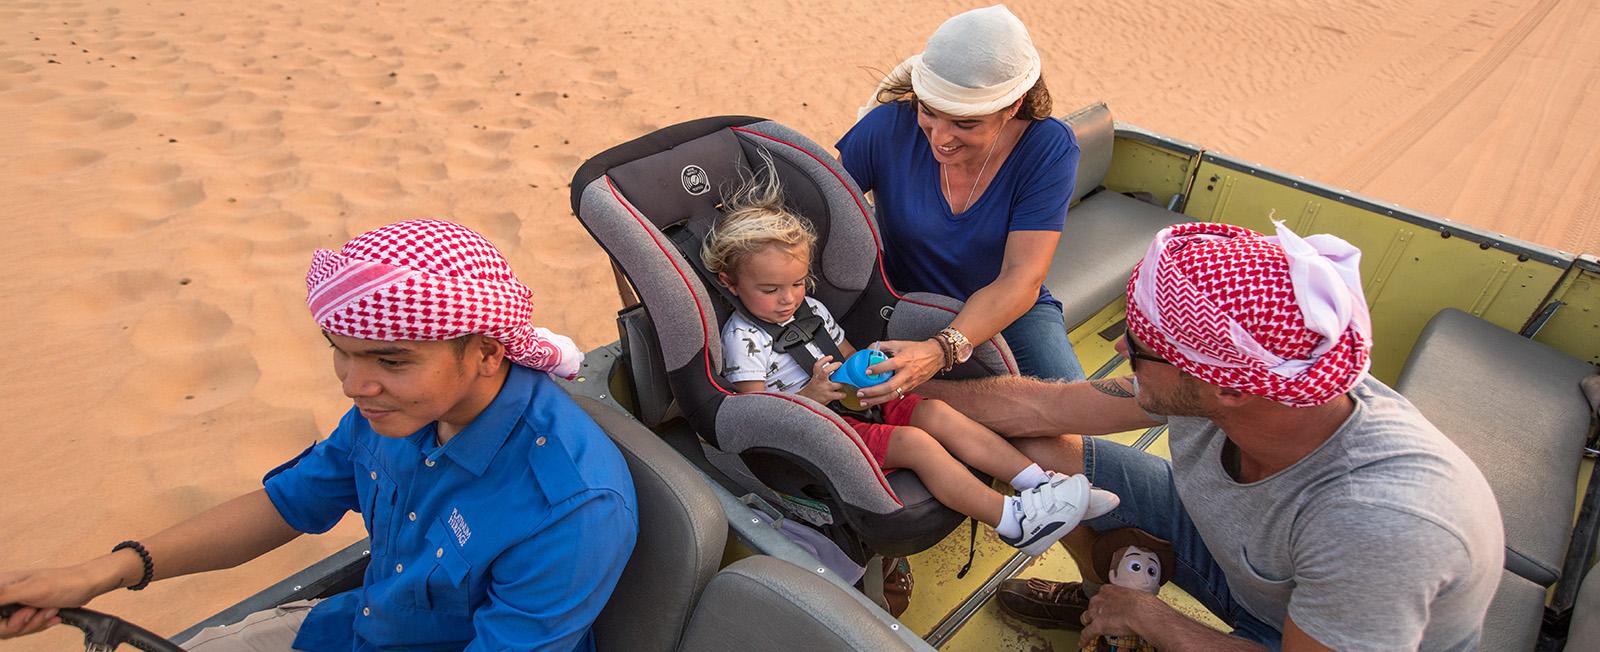 Heritage Desert Safari Dubai - Platinum Heritage